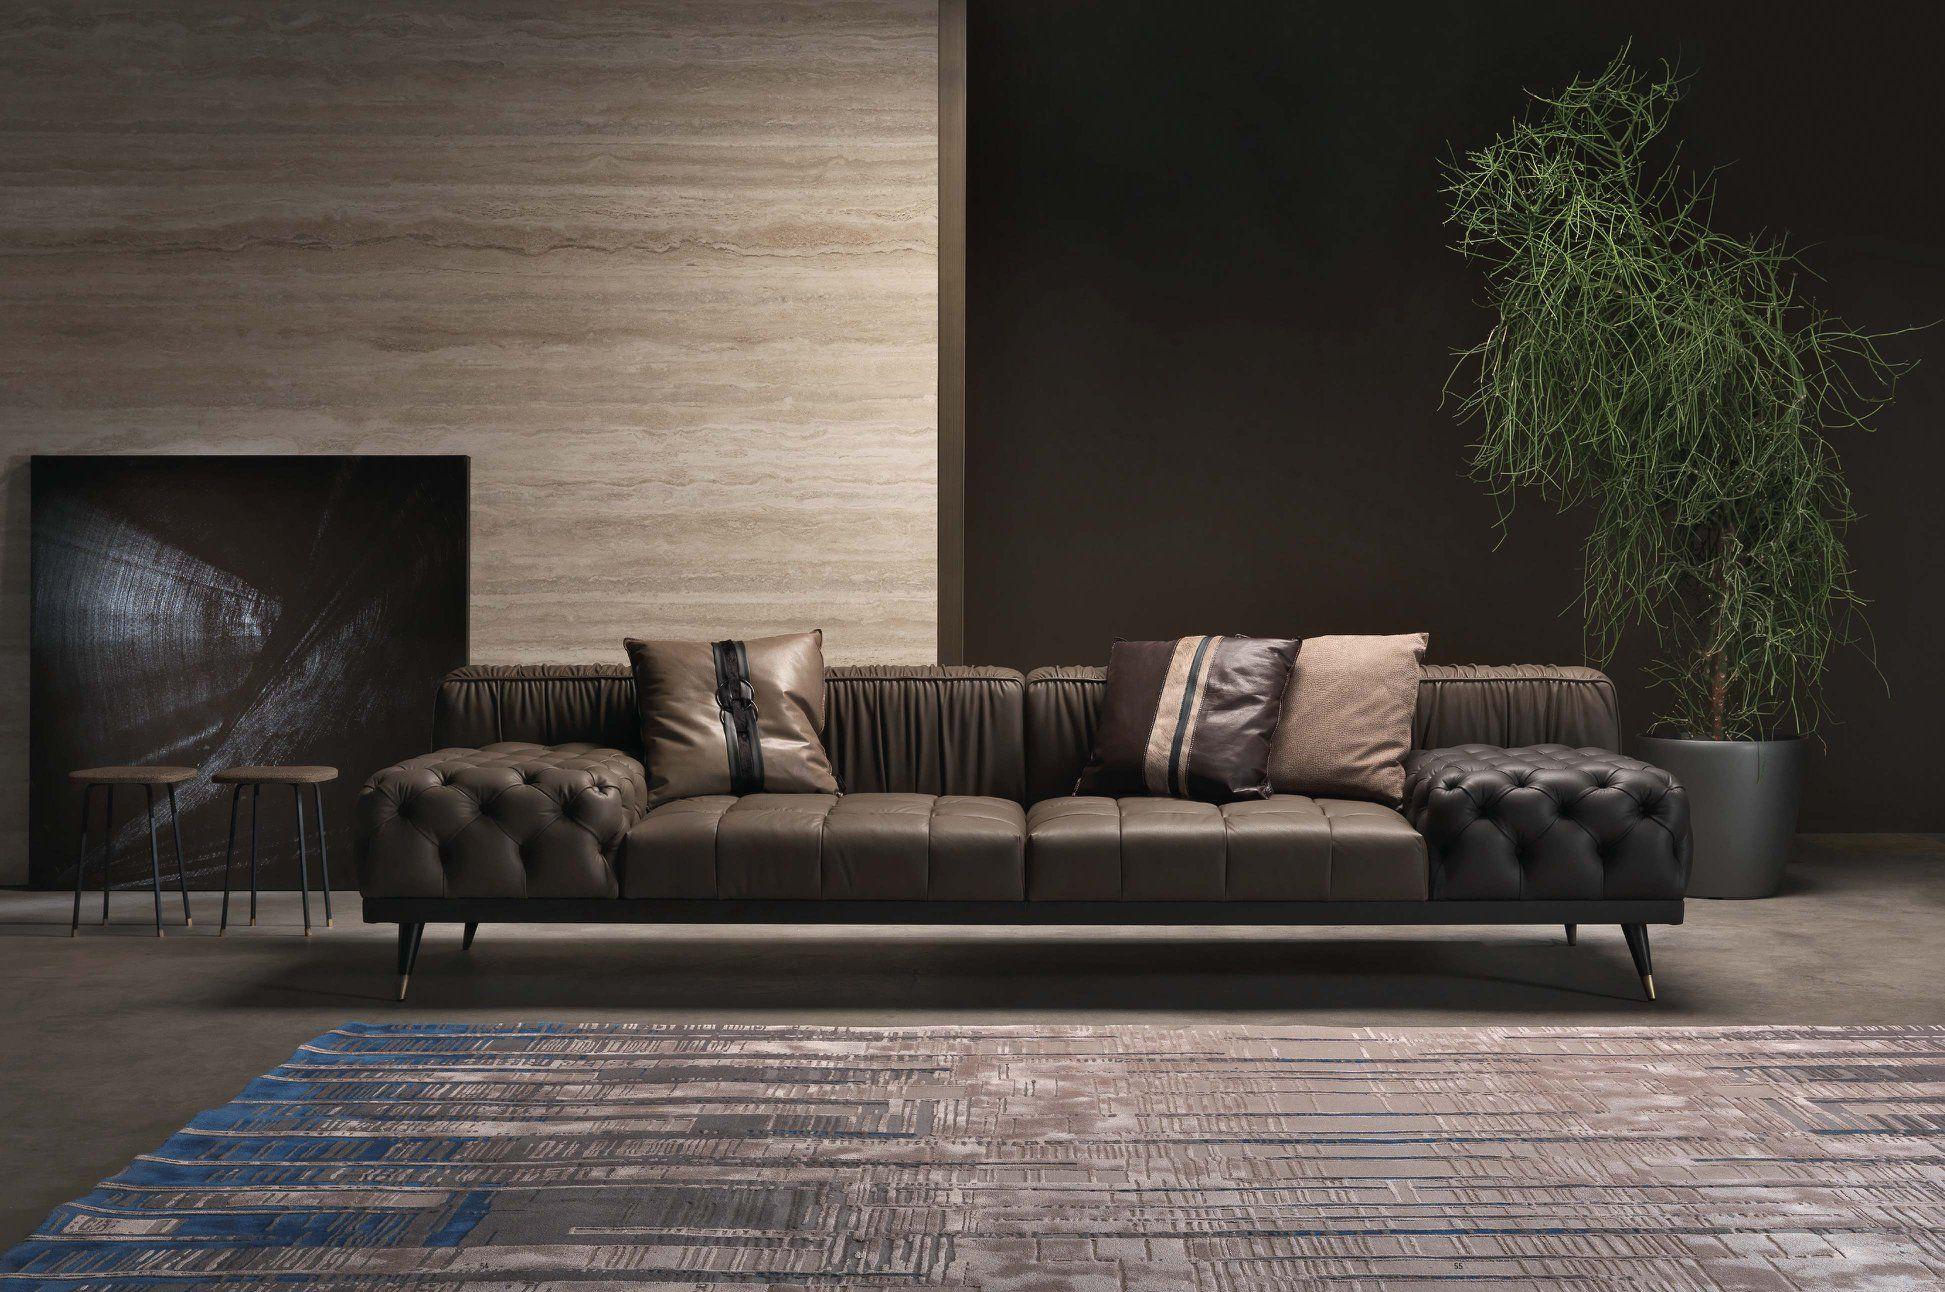 Italian Luxury Furniture Designer Furniture Singapore Da Vinci Lifestyle Furniture Design Furniture Contemporary Furniture Design